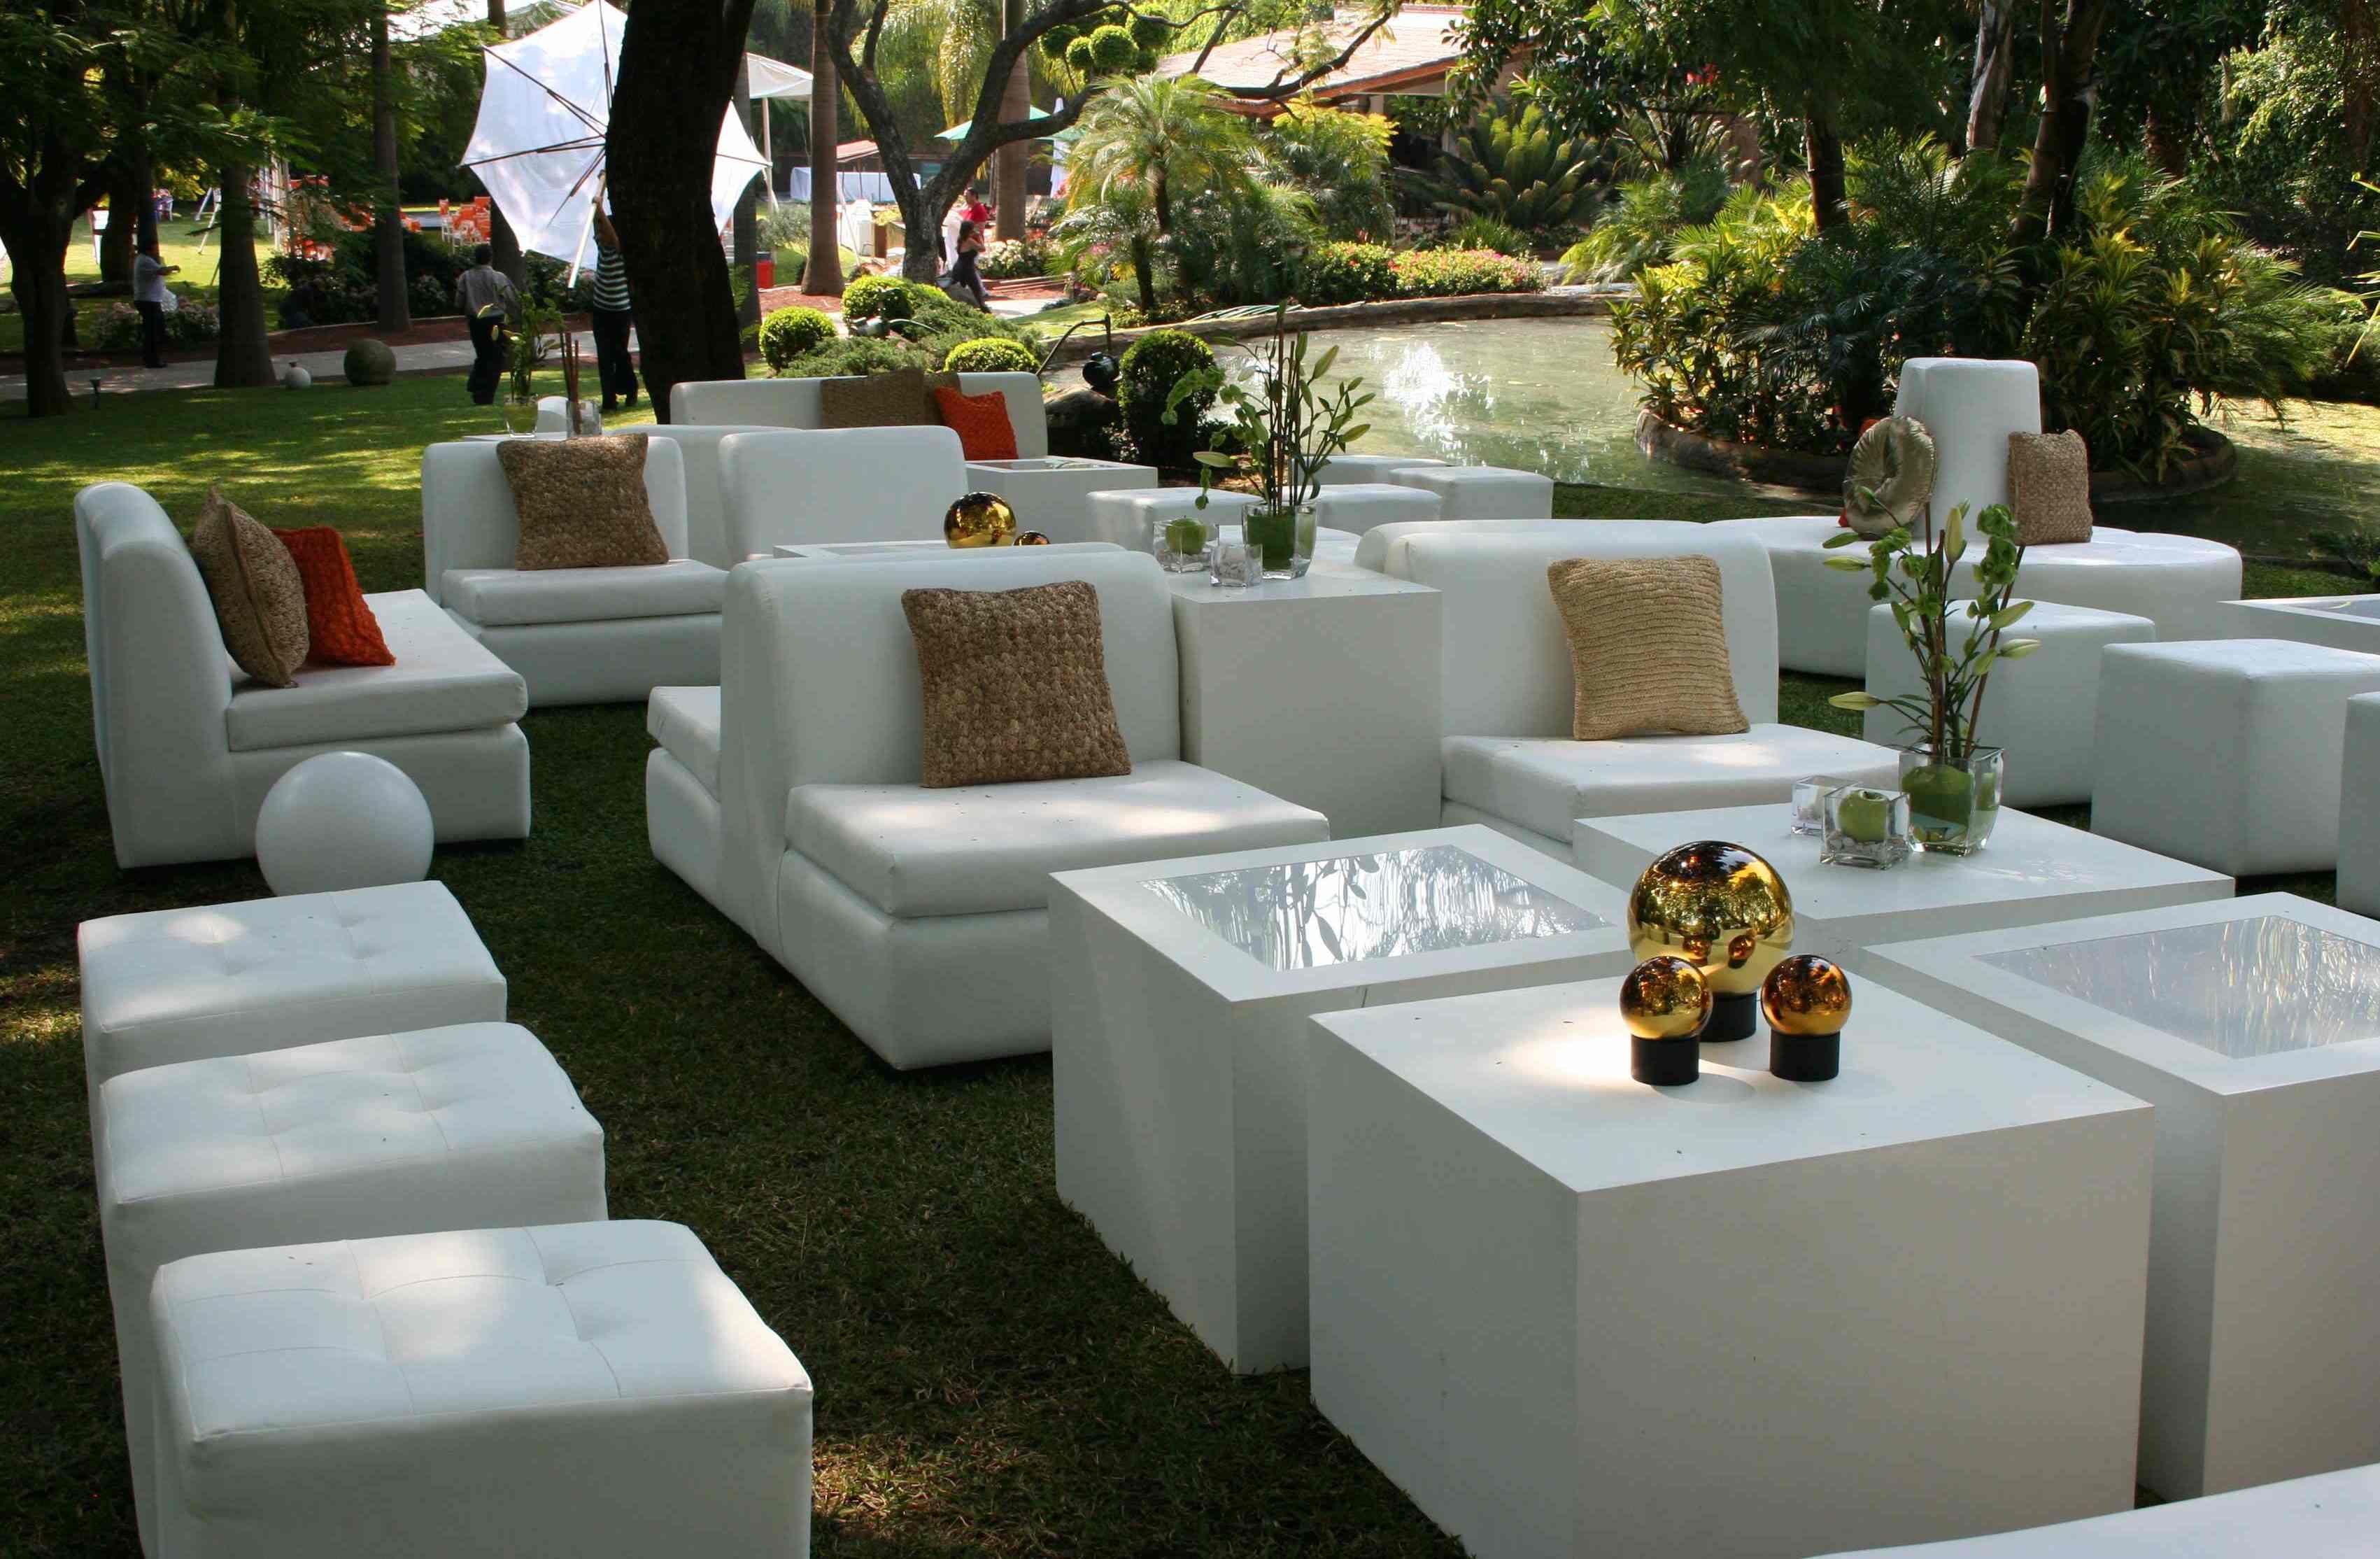 Muebles Lounge Para Eventos - Muebles Para Eventos Buscar Con Google Ls Pinterest [mjhdah]http://casafiestas.com/wp-content/uploads/2013/04/salas-1.jpg